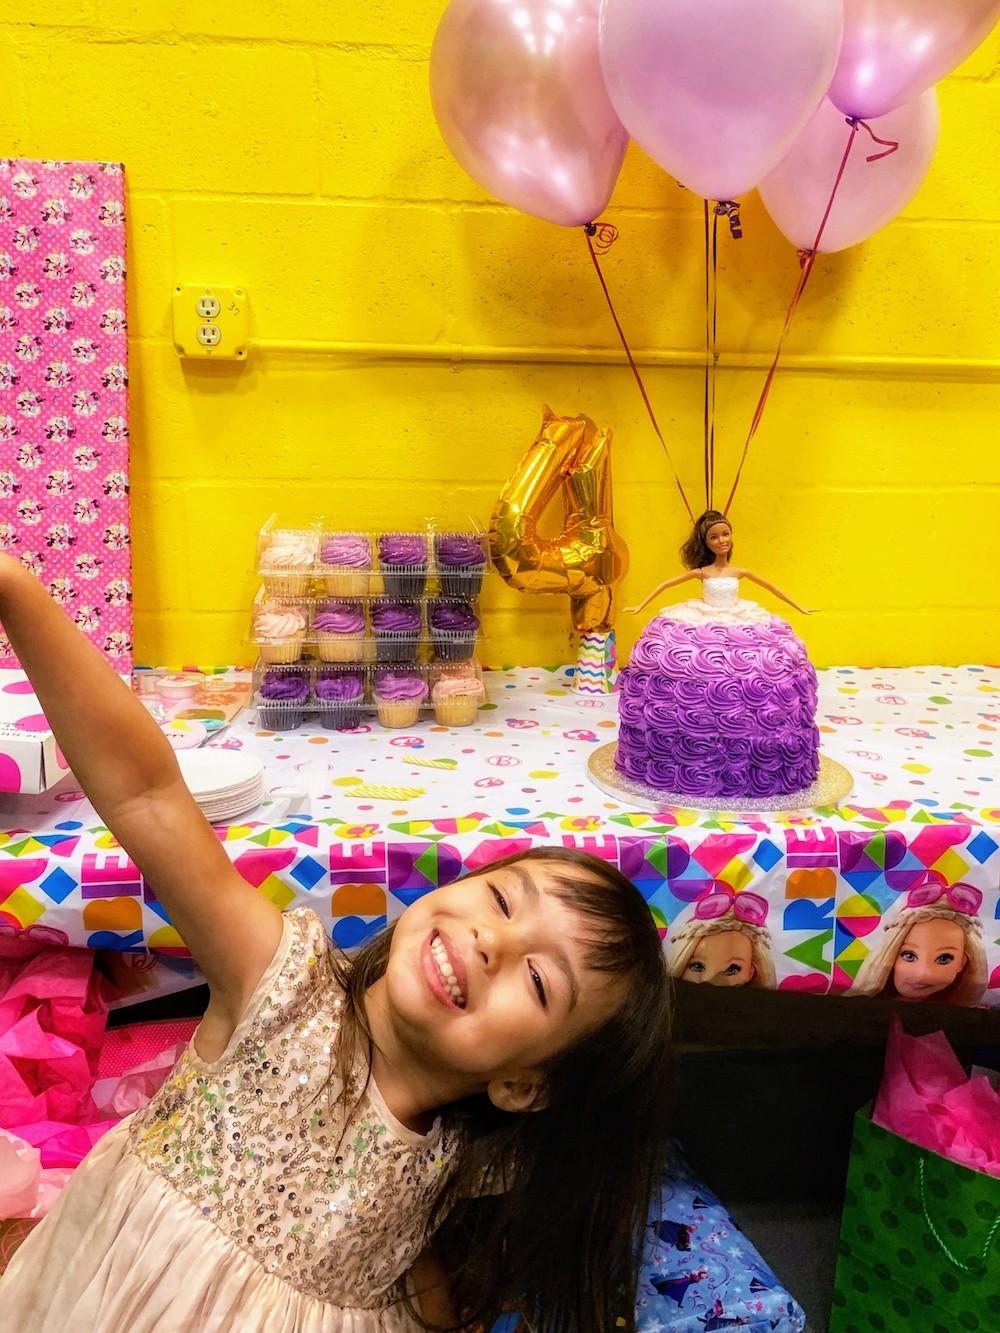 Elyse on her 4th birthday